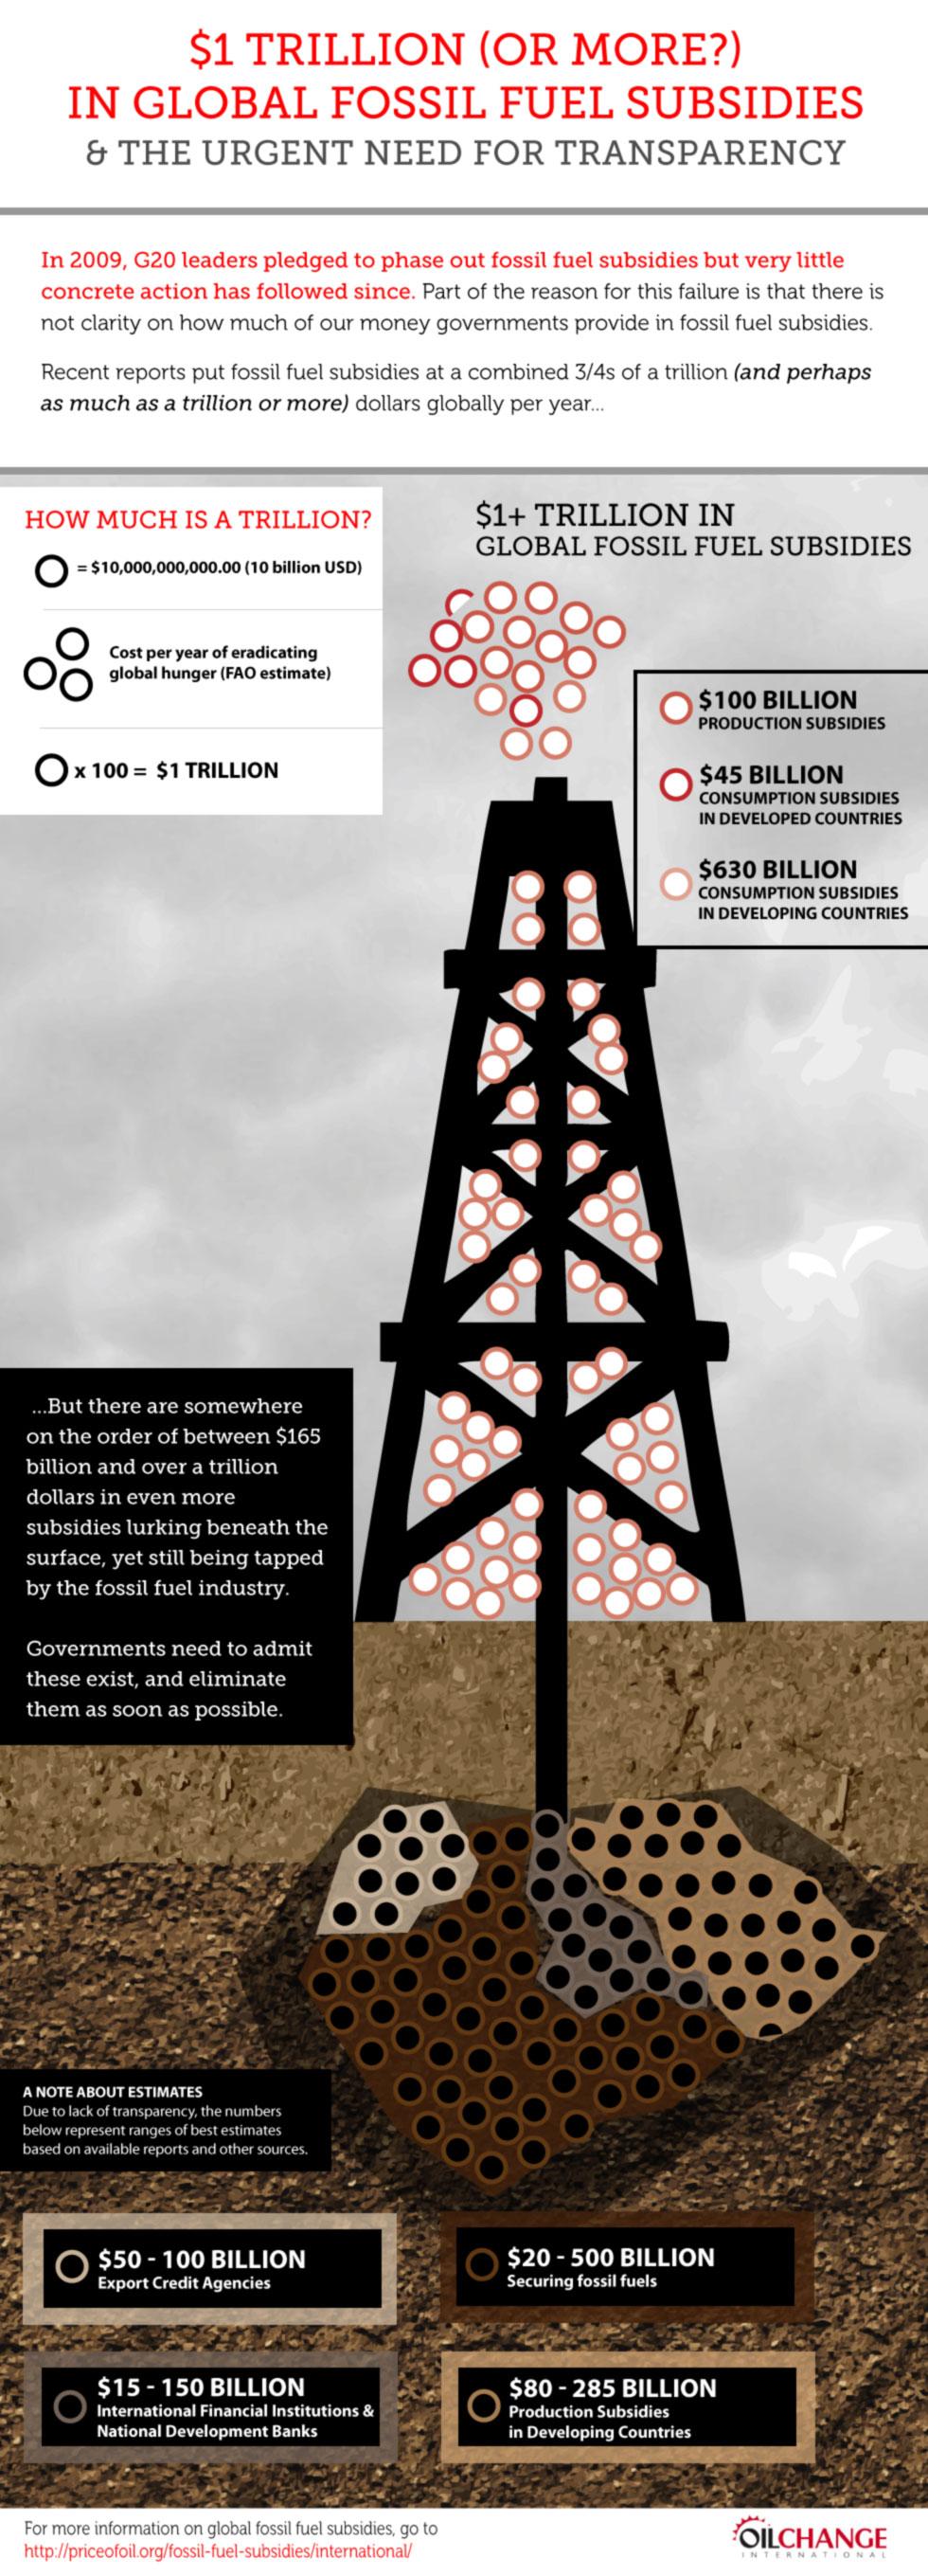 2012-06-18-OCI_infographic_web.jpg